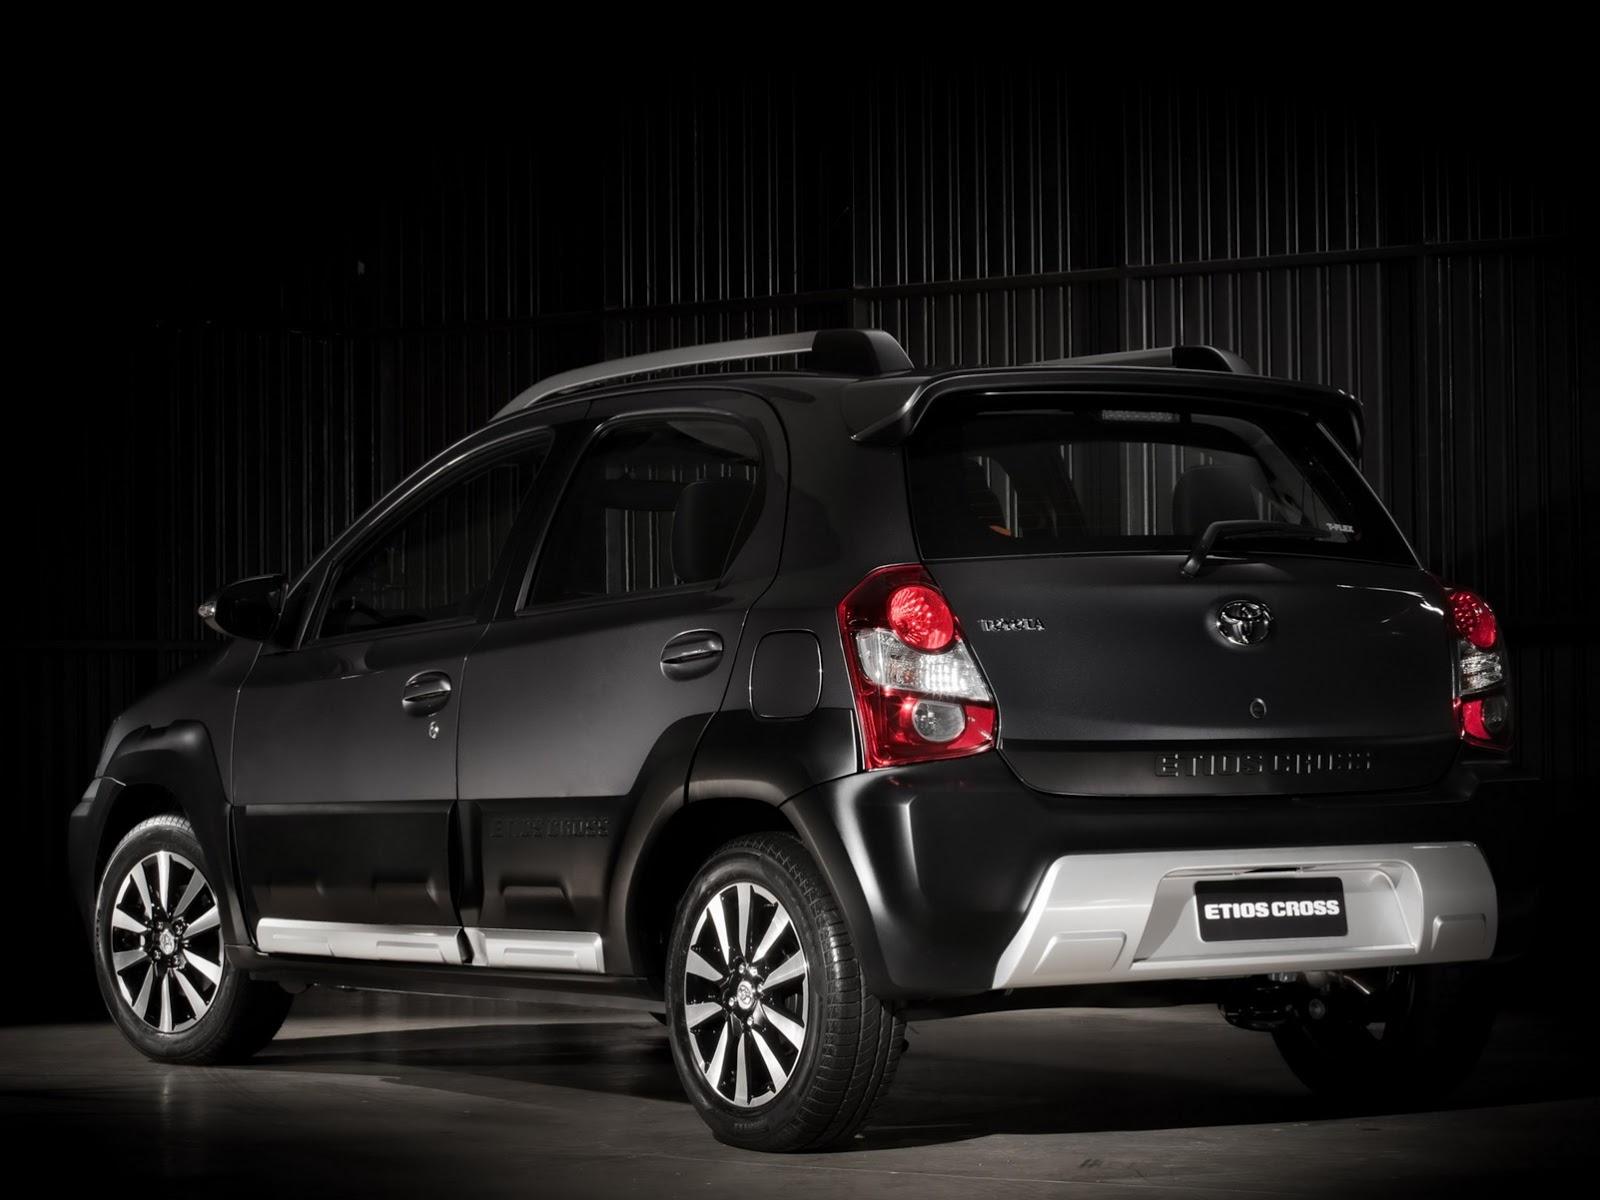 [Toyota-Etios-Cross-5%255B4%255D.jpg]